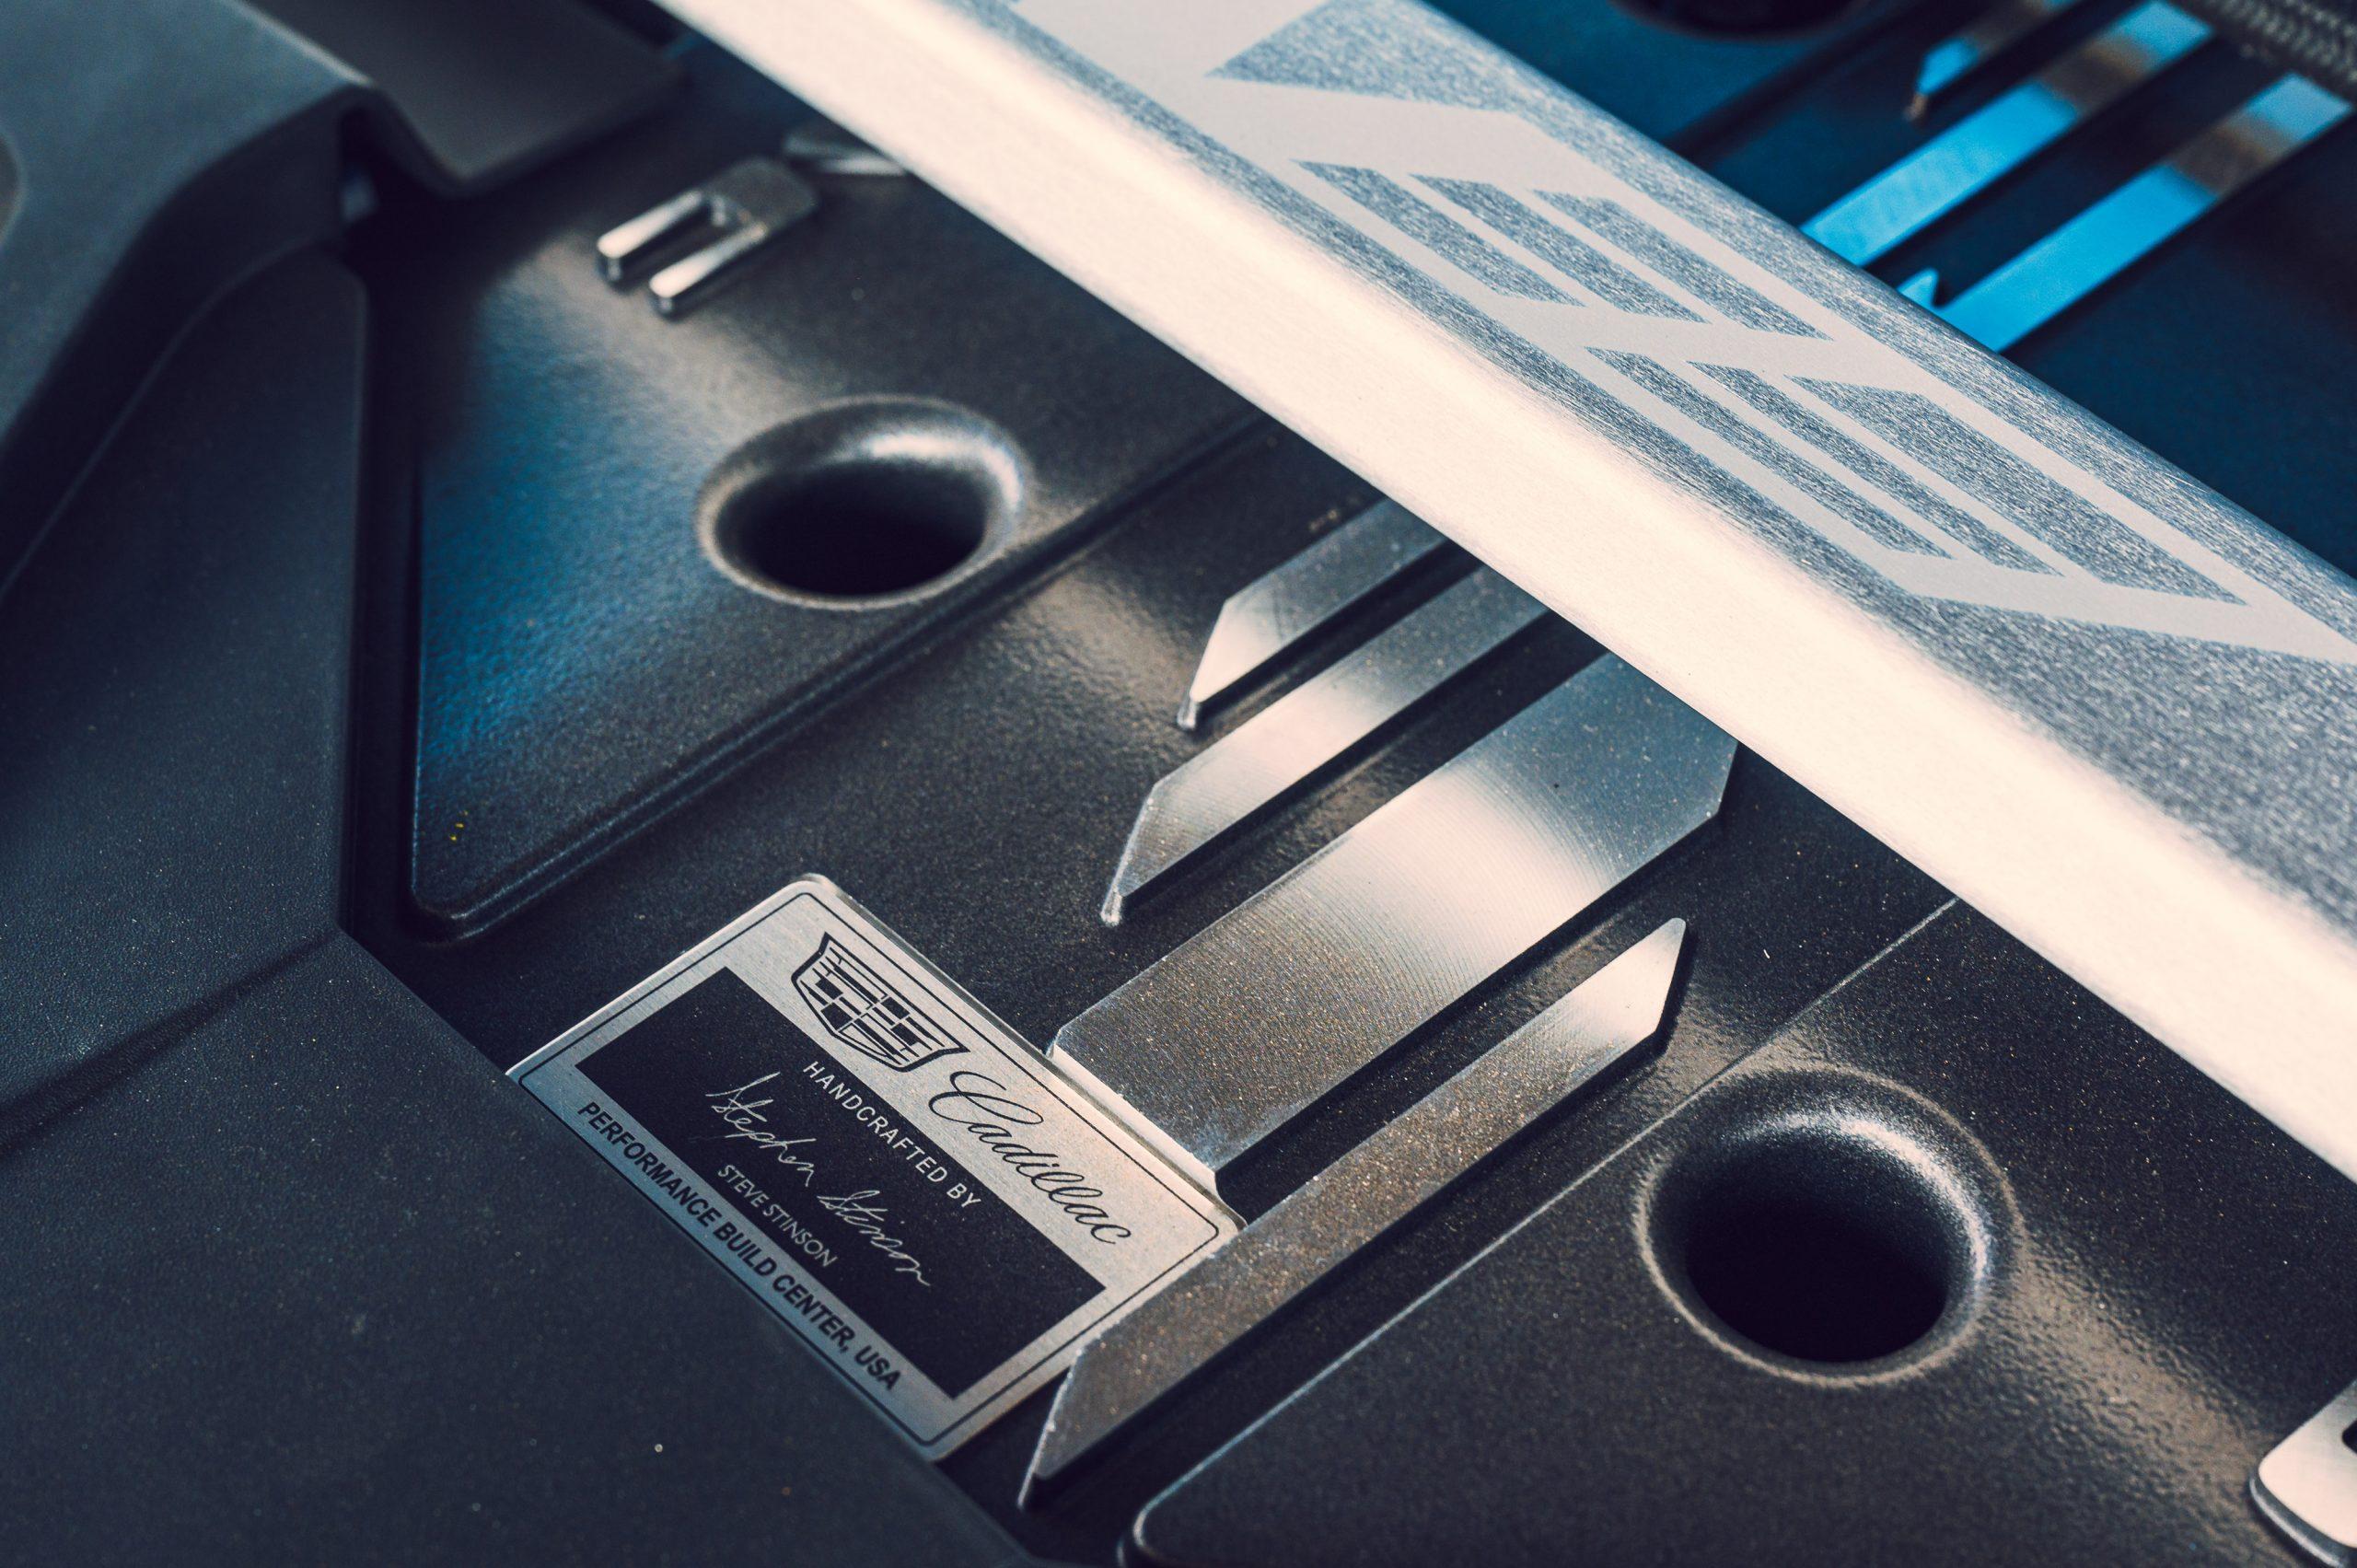 2022 Cadillac CT5-V Blackwing engine badge plate